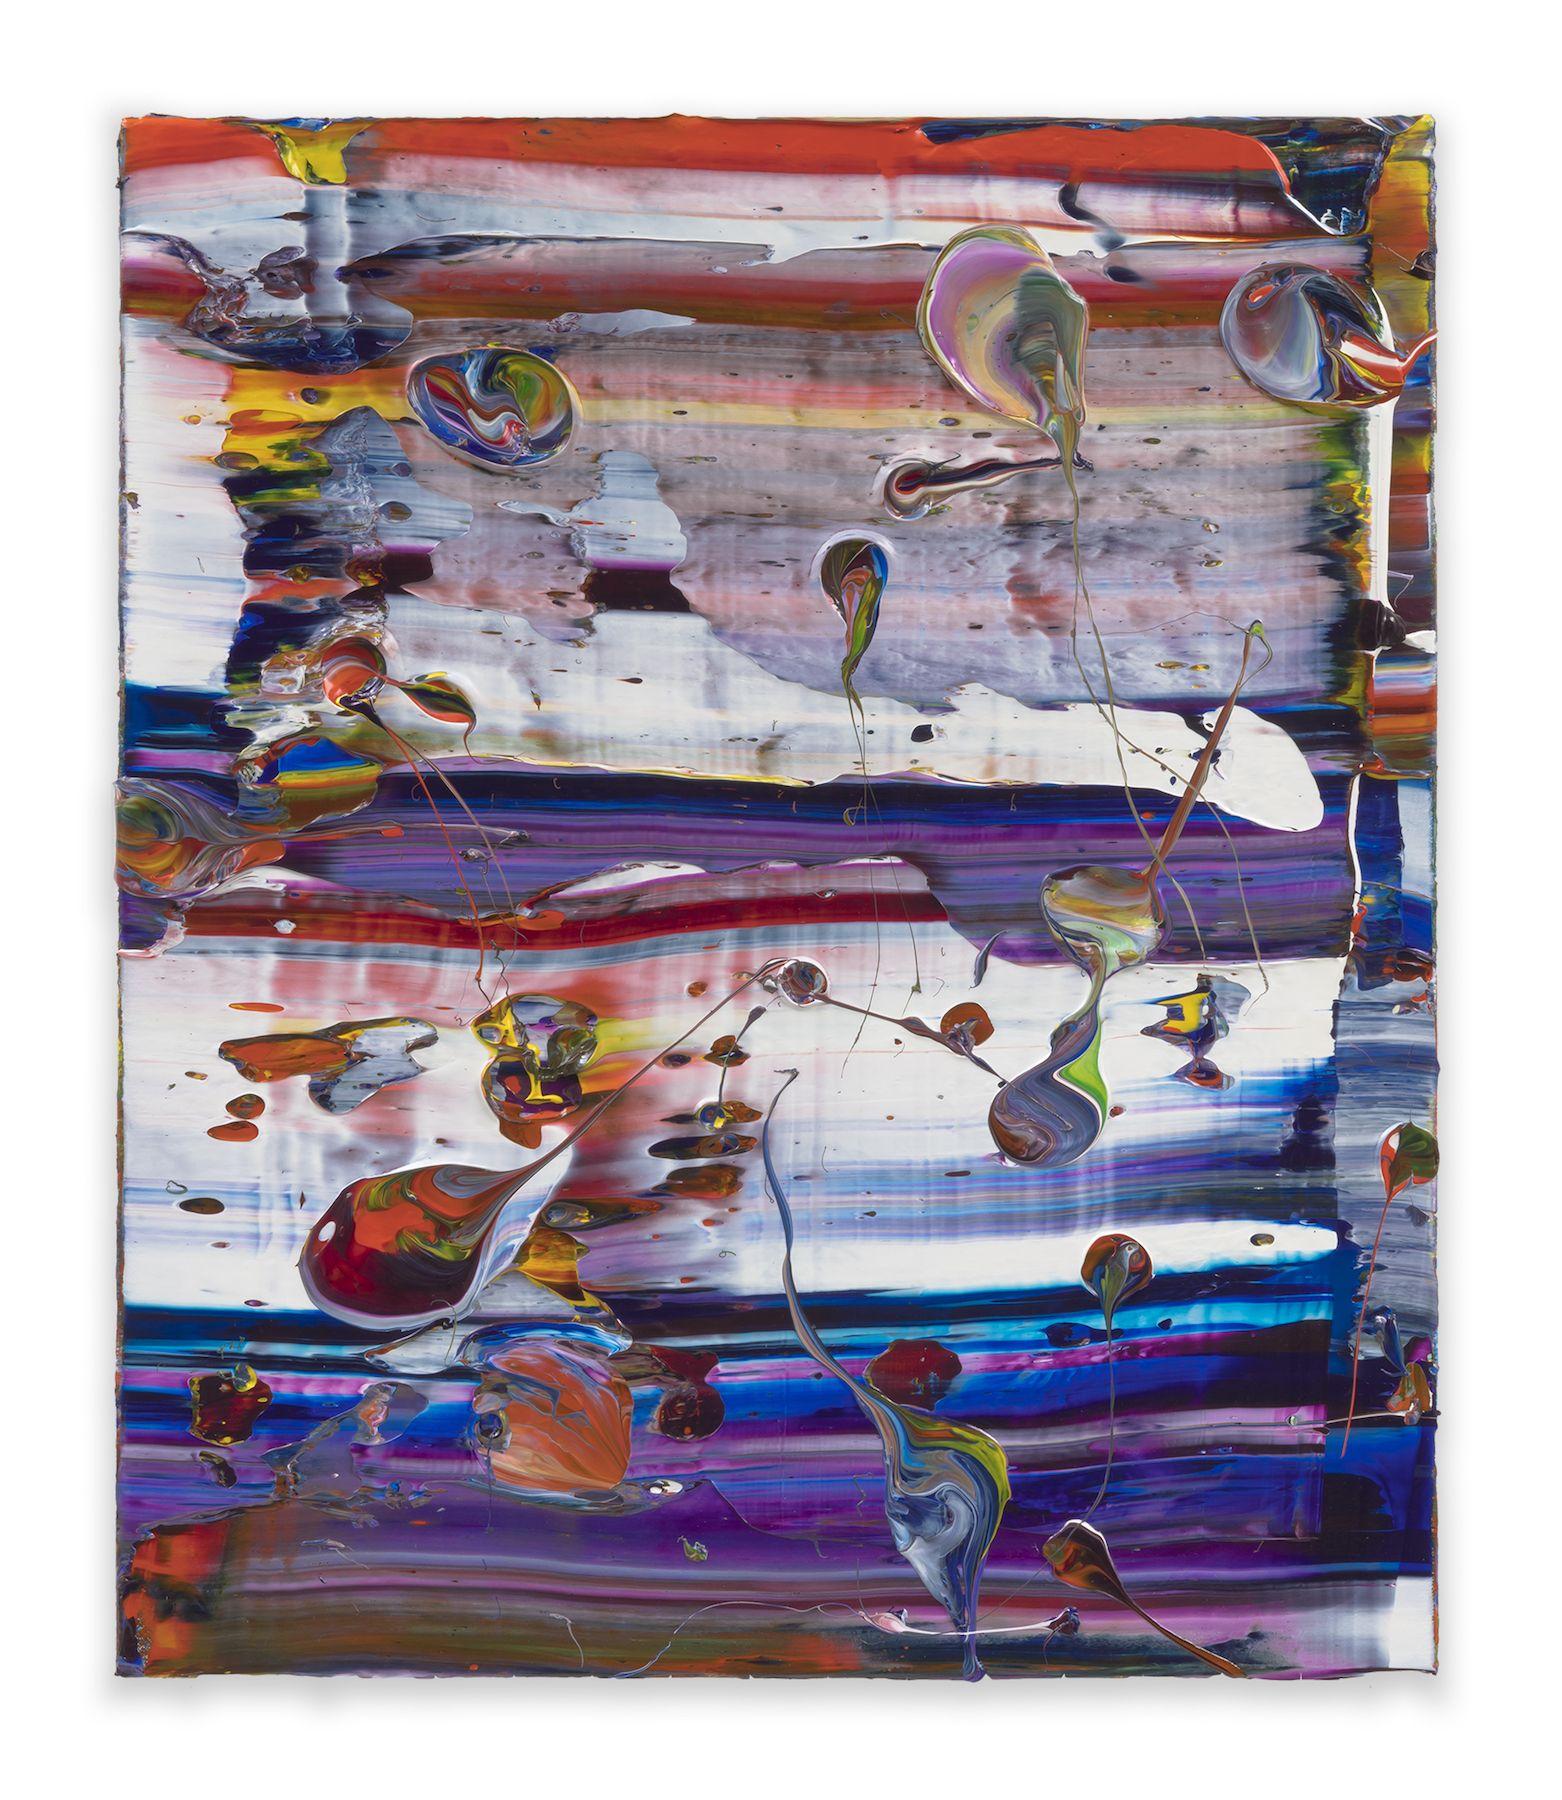 Mashin Mogul, 2018, Acrylic on linen, 26 x 22 inches, 66x 55.9cm, MMG#30226